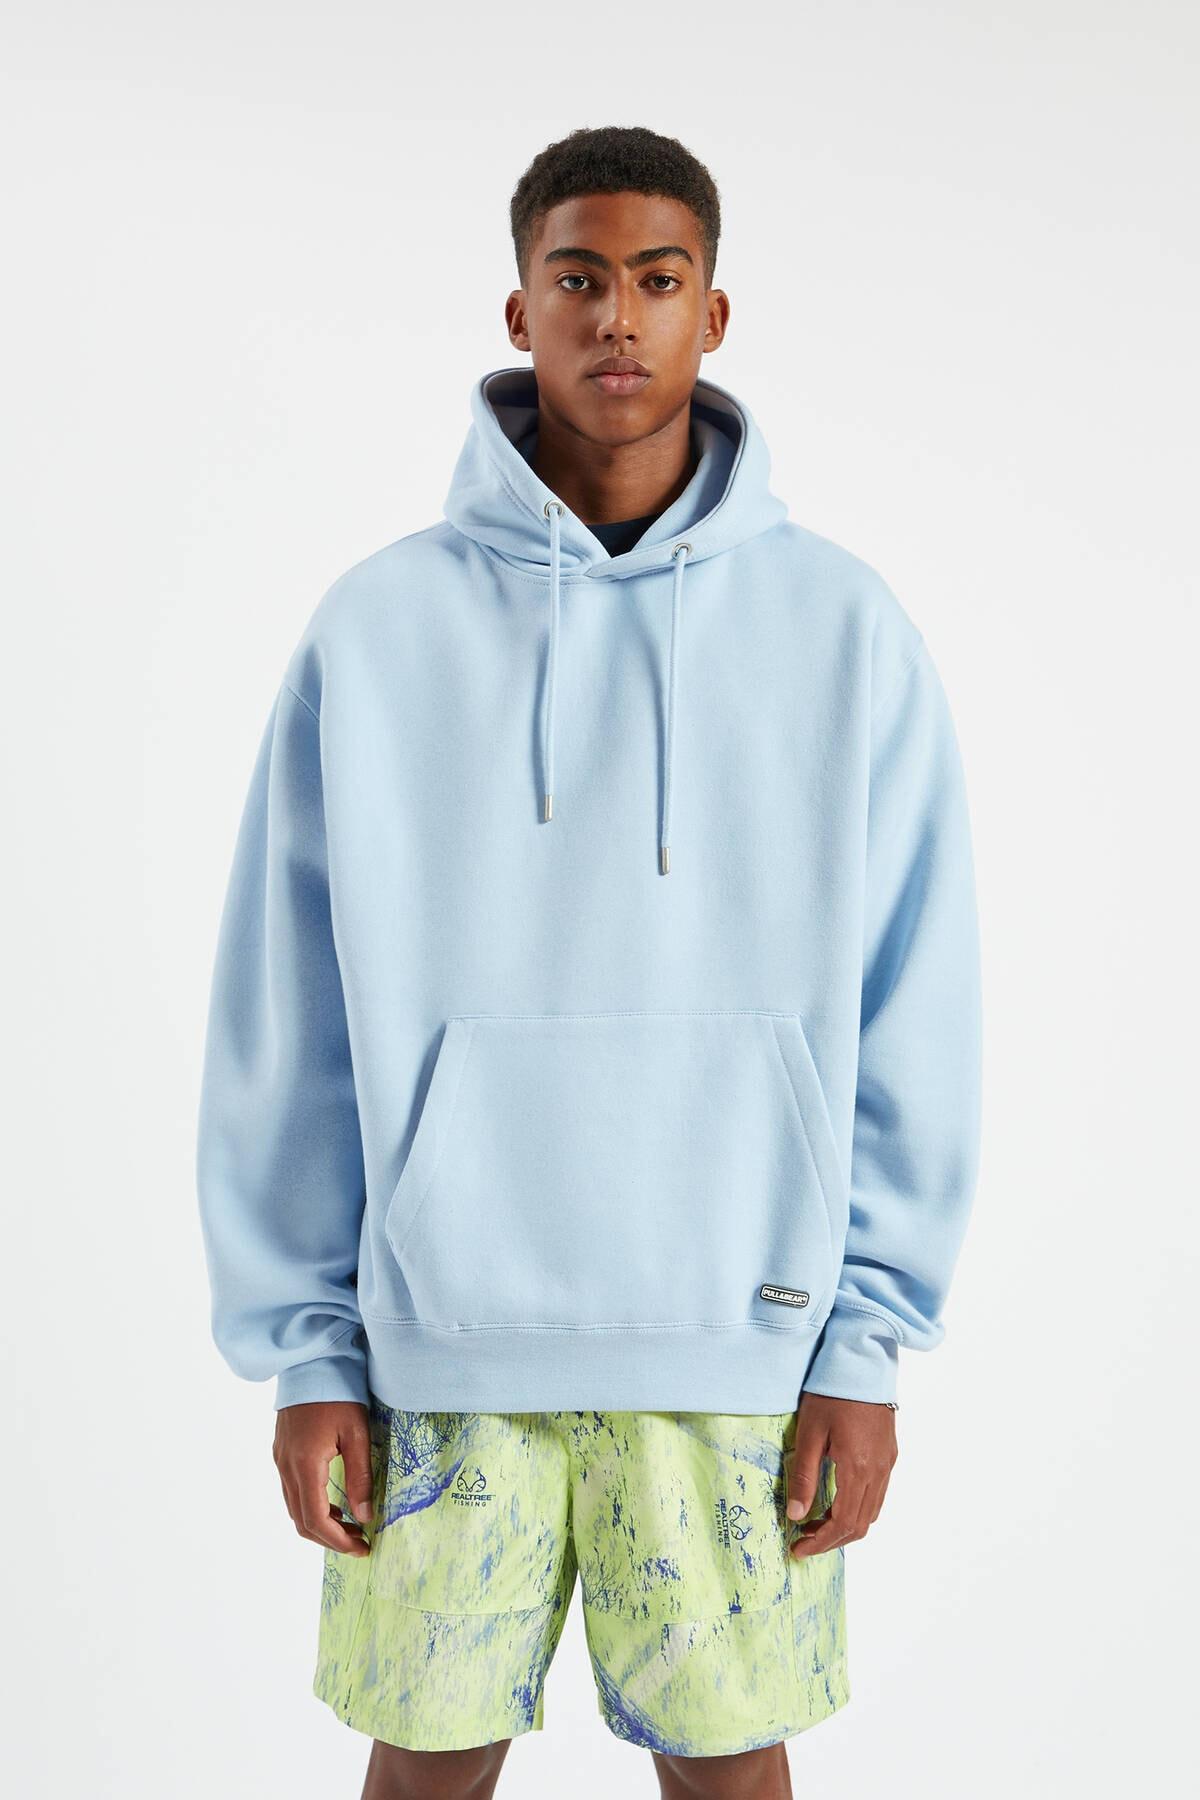 Pull & Bear Erkek Gök Mavisi Kapüşonlu Kanguru Cepli Basic Sweatshirt 09594513 0